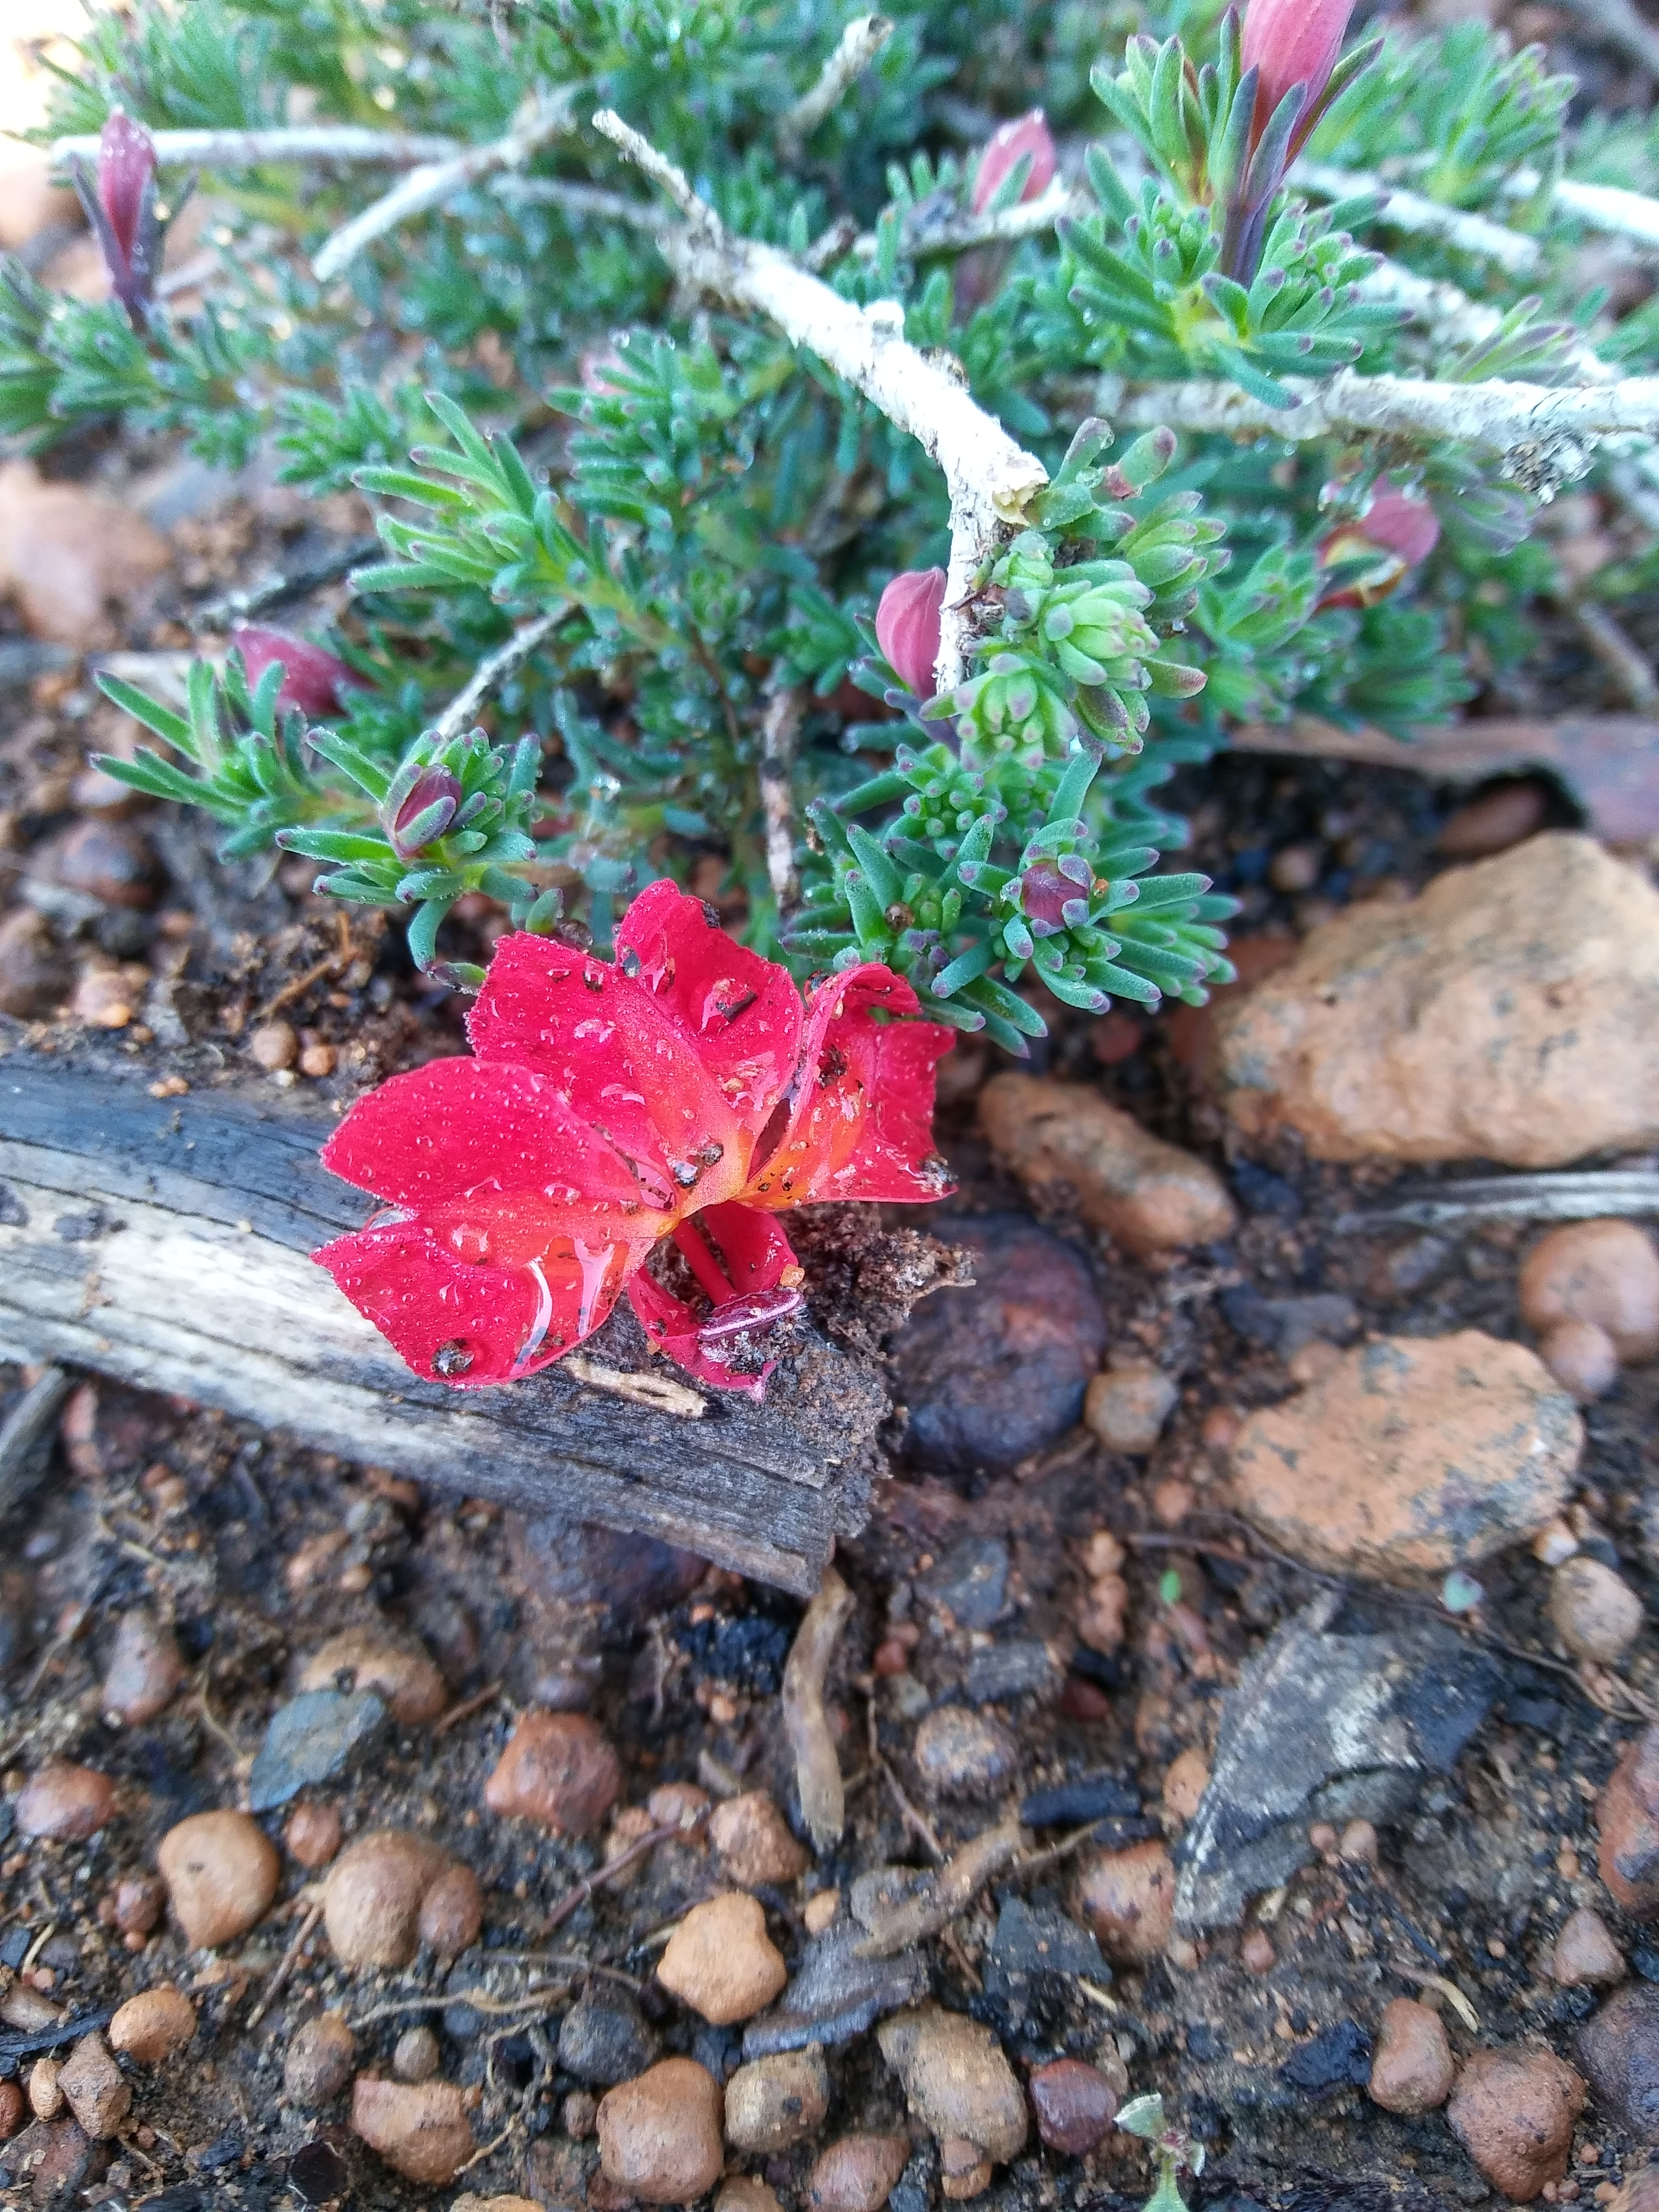 20180715_092443_HDRof my scarlet leschenaultia